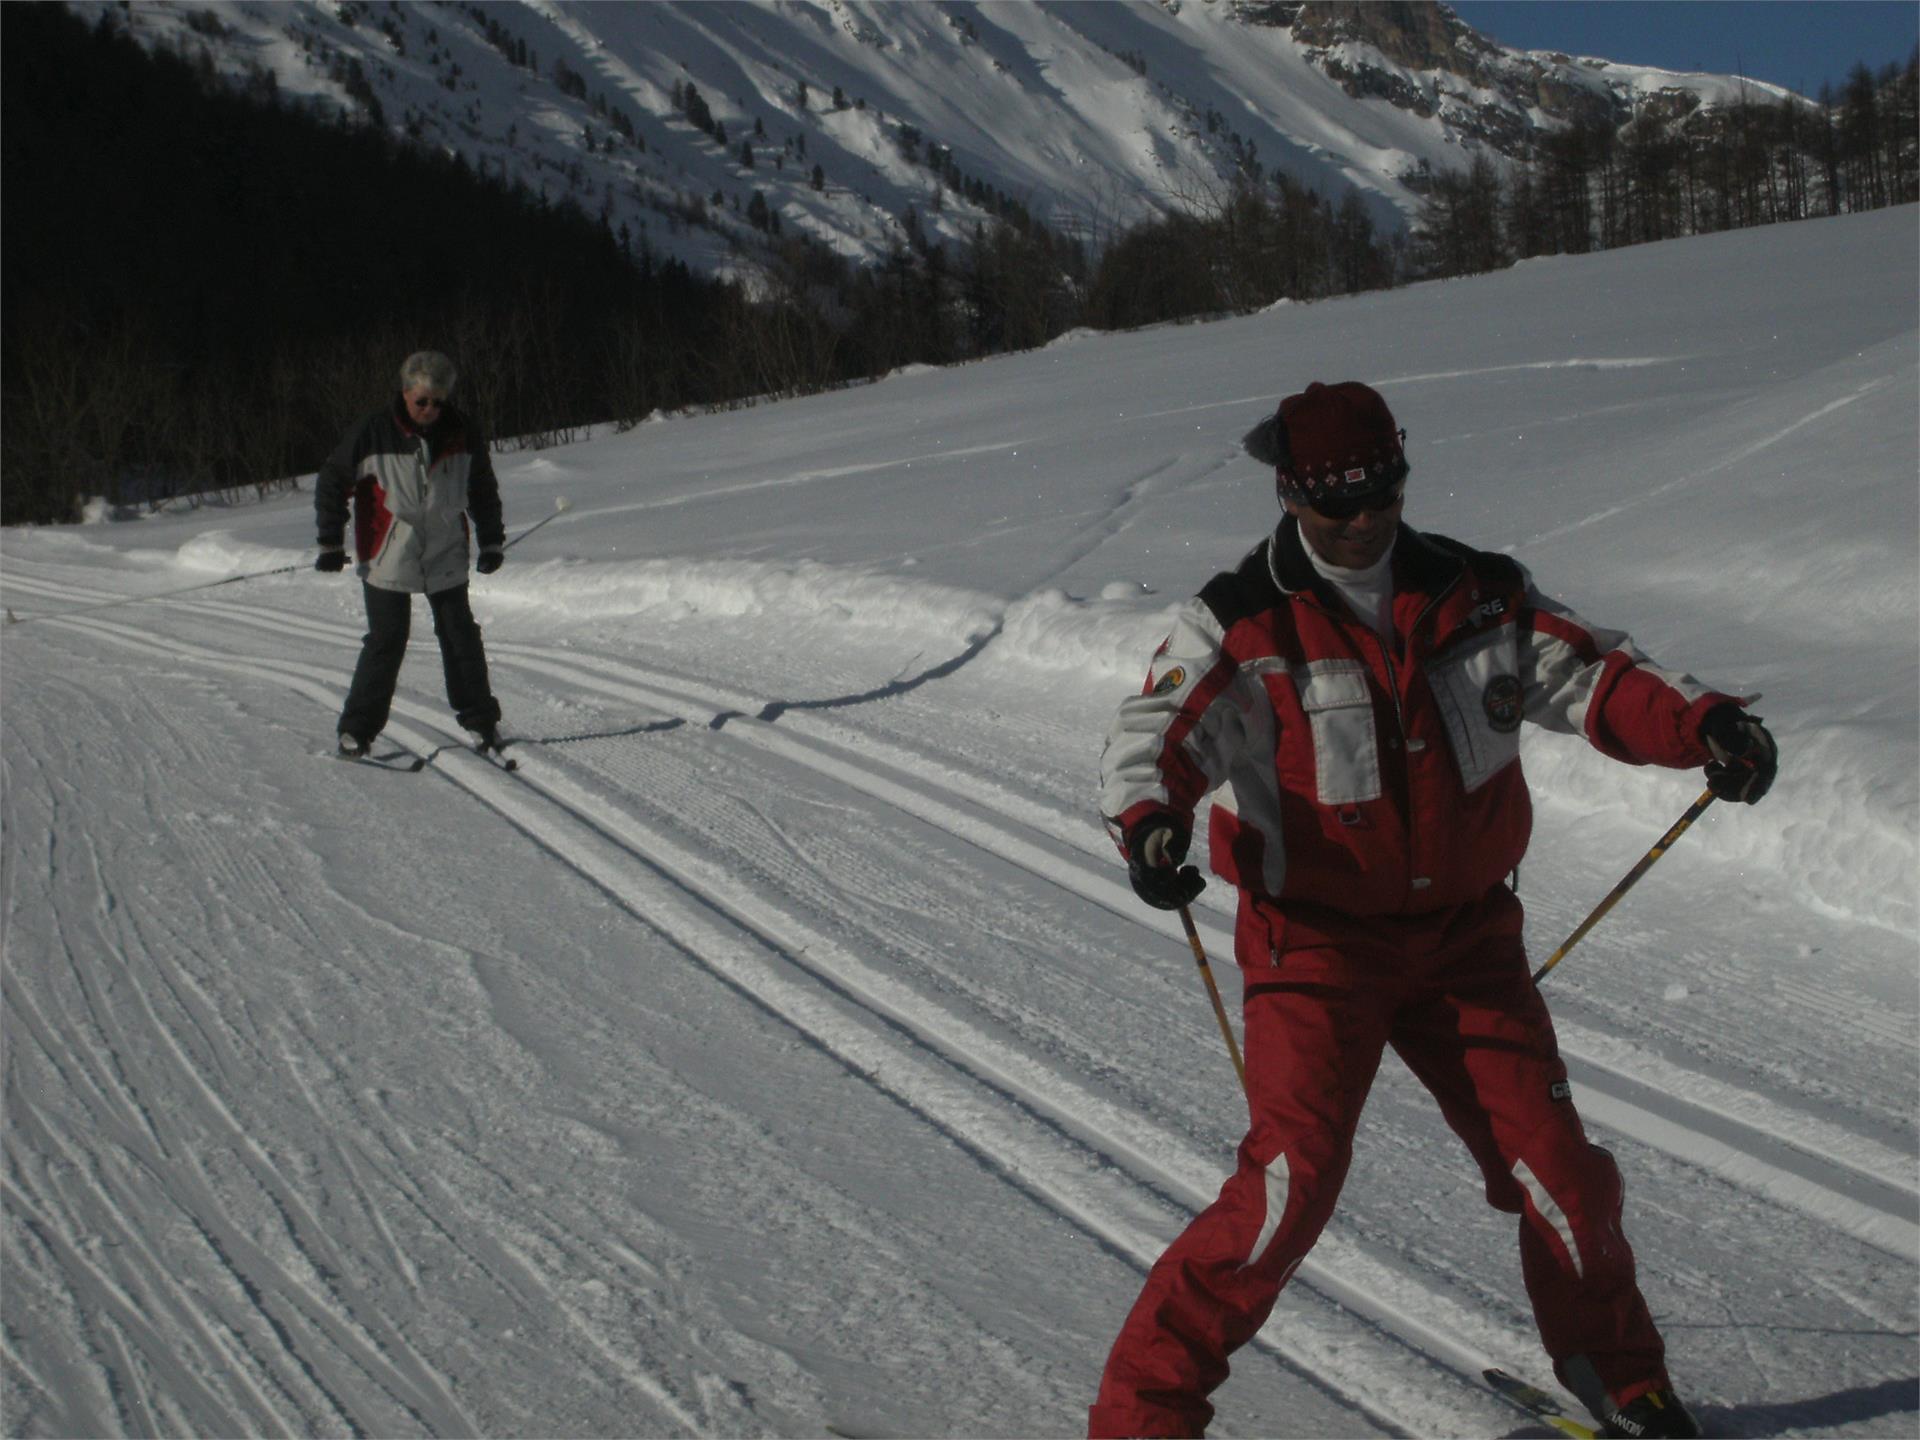 ... with ski master Florl